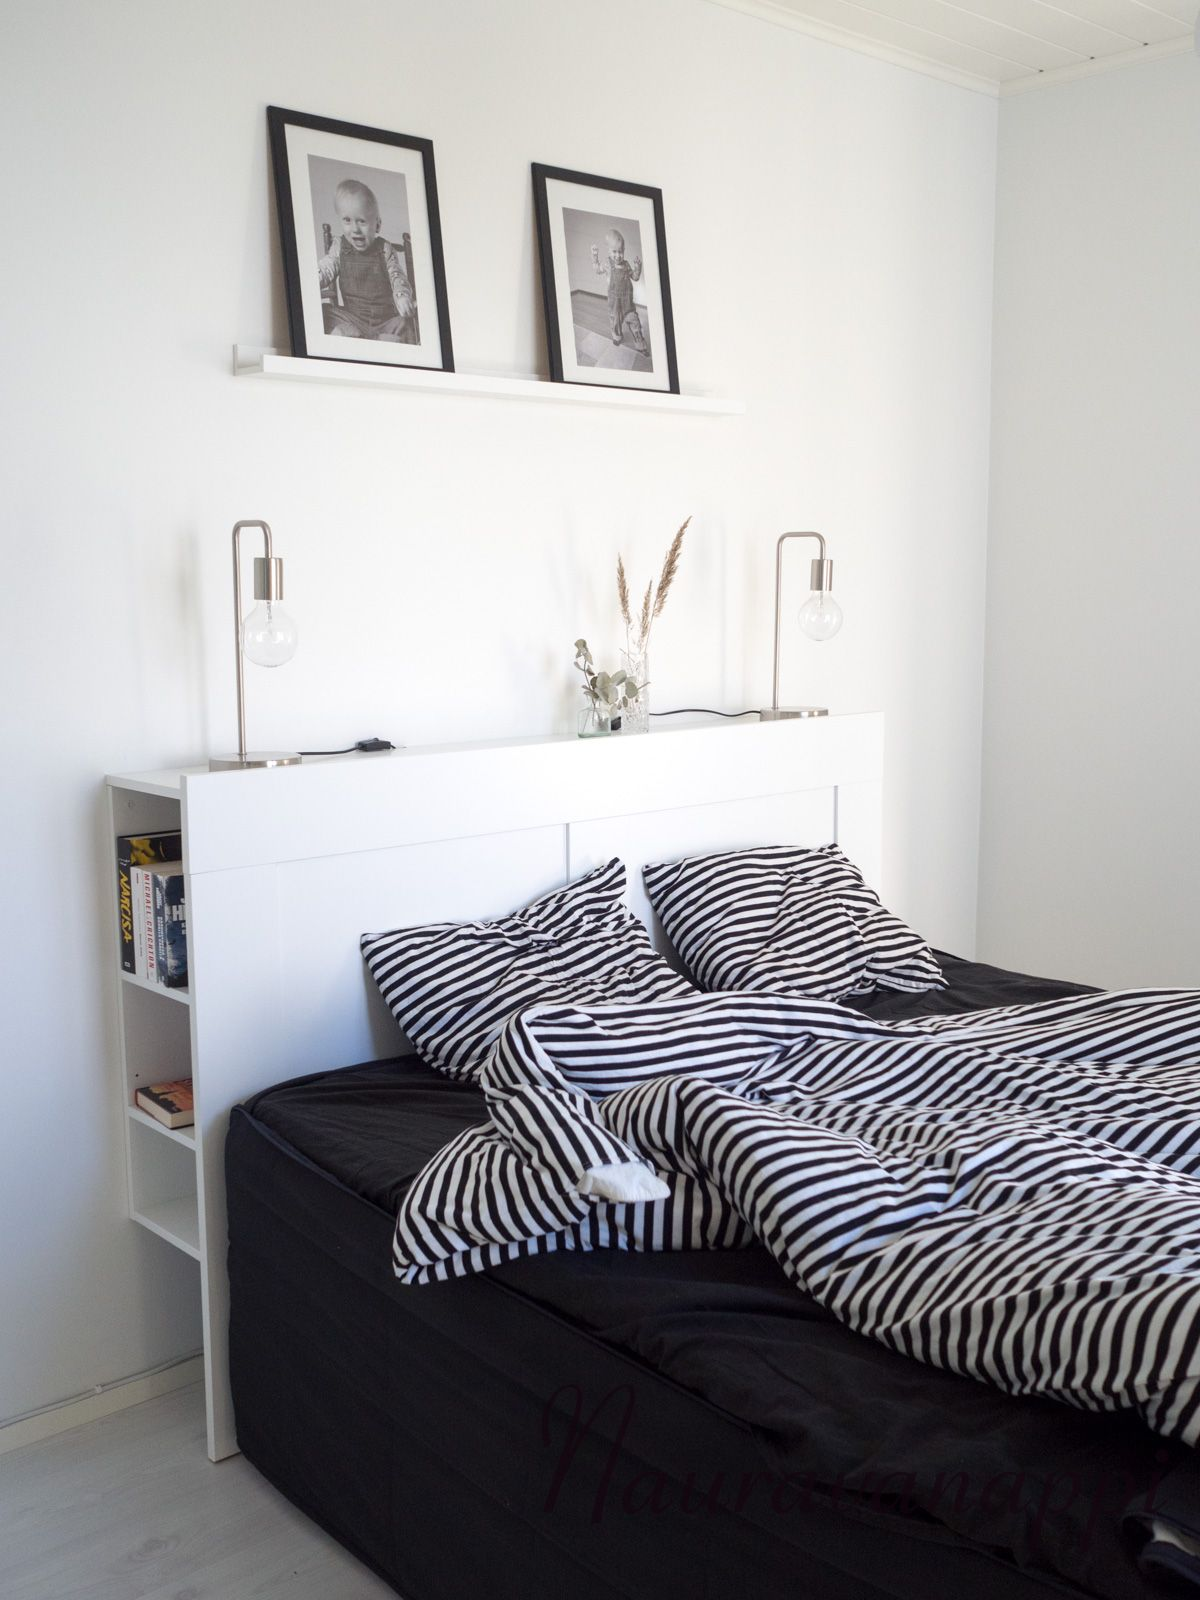 Marimekko Tasaraita Ikea Brimnes Sangynpaaty Ikea Bed Home Bedroom Brimnes Bed